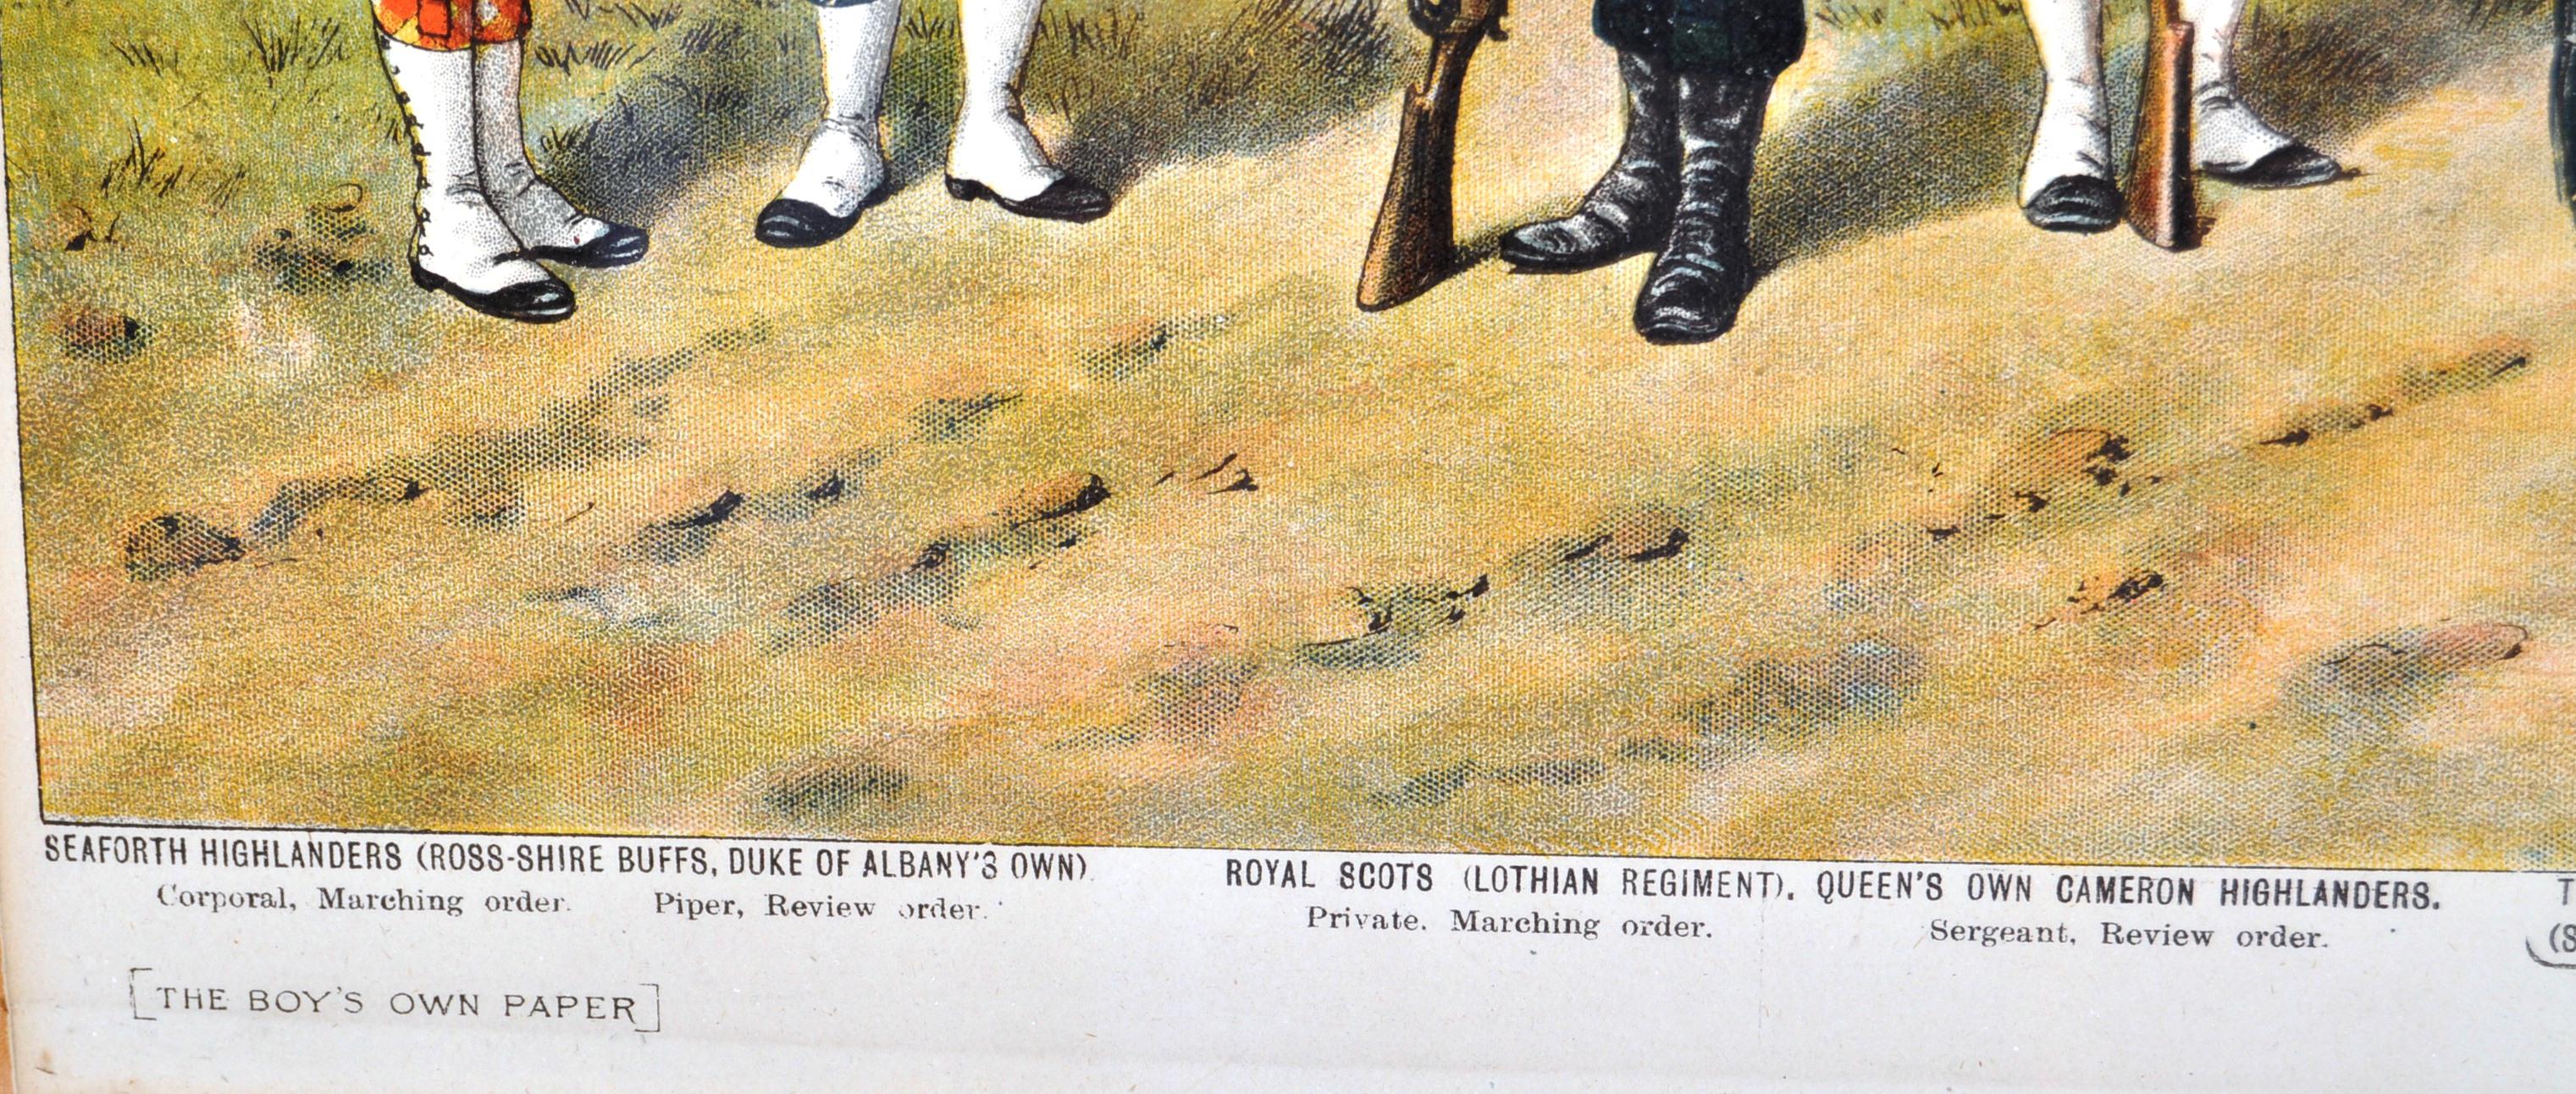 RICHARD SIMKIN - THE SCOTTISH REGIMENTS OF THE BRITISH ARMY - Image 4 of 7